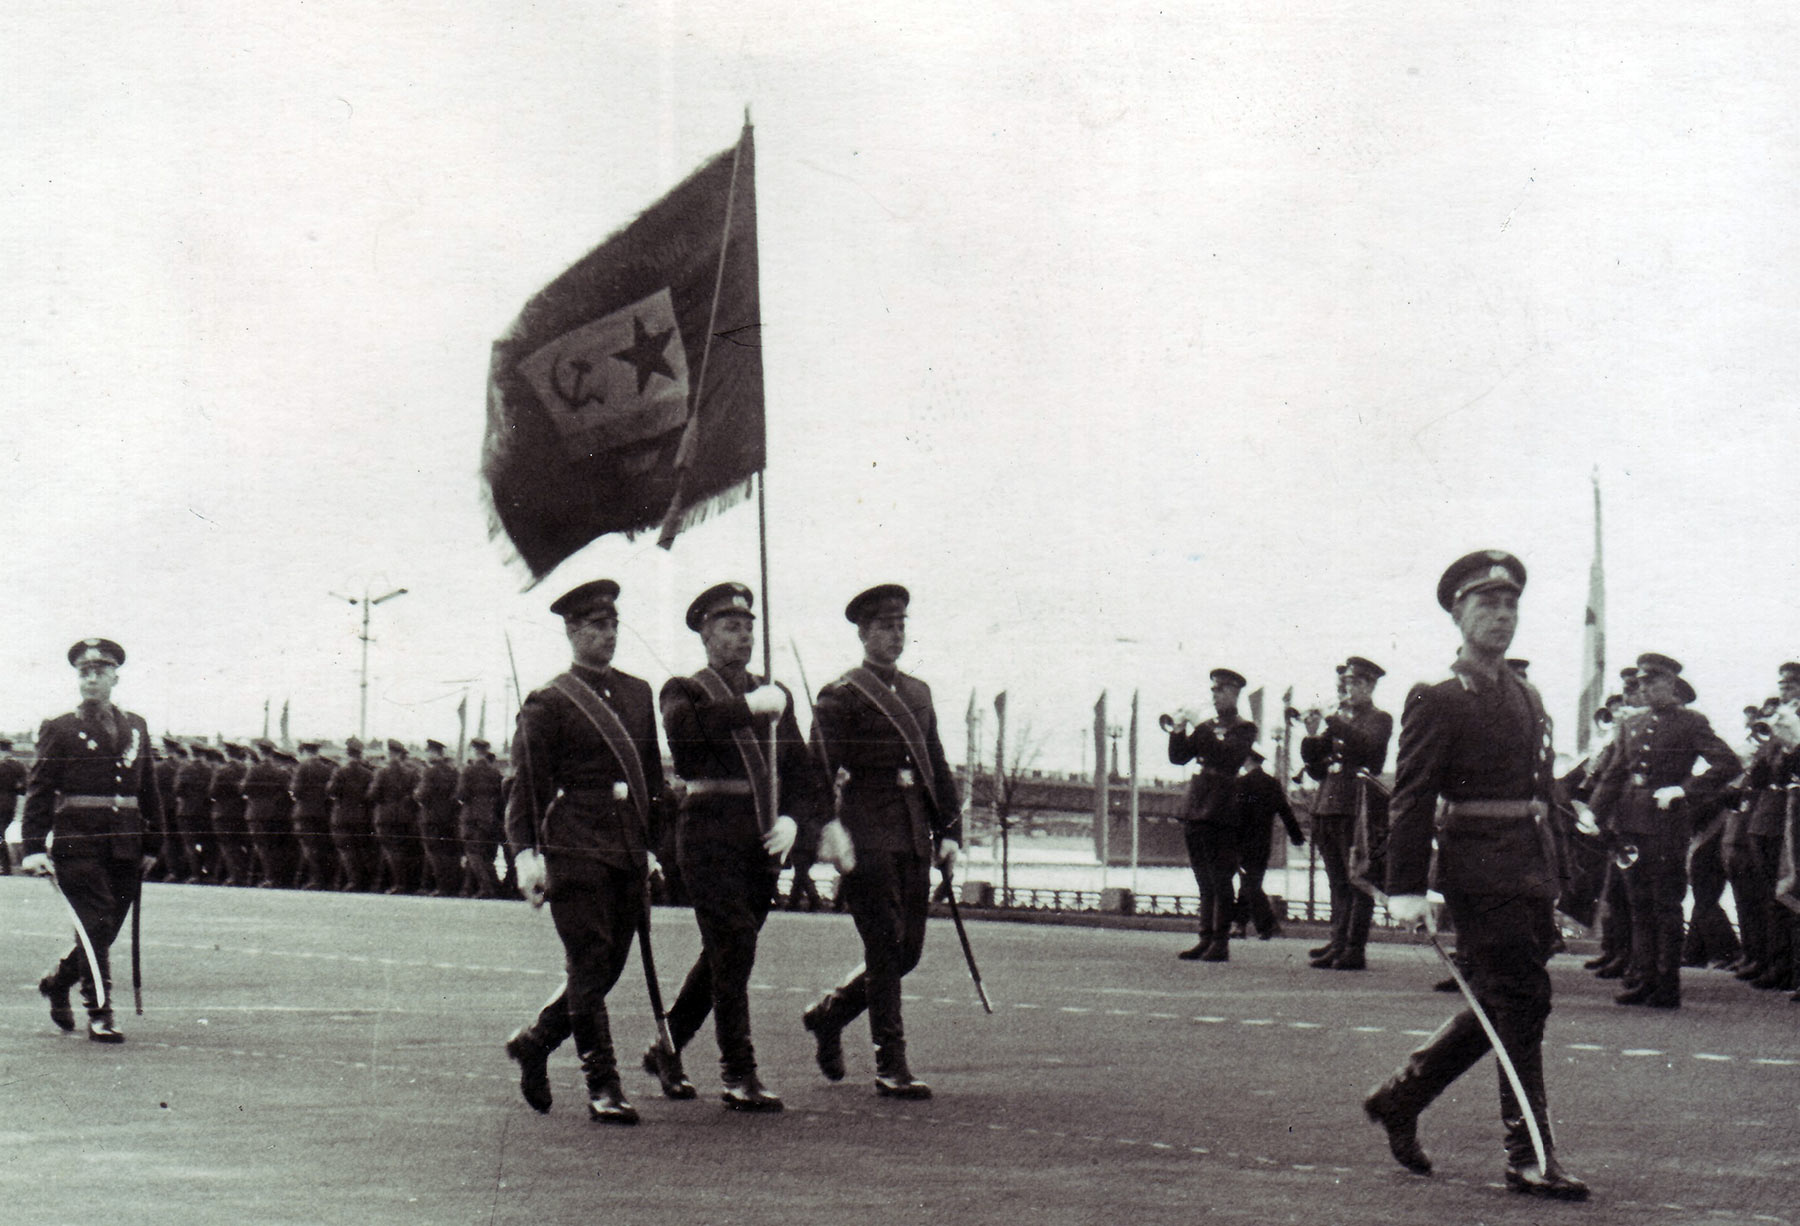 Рига, Комсомольская набережная Парад 1 мая 1962г. Группу знаменосцев возглавляет командир батальона майор Гагарин Ю.И.